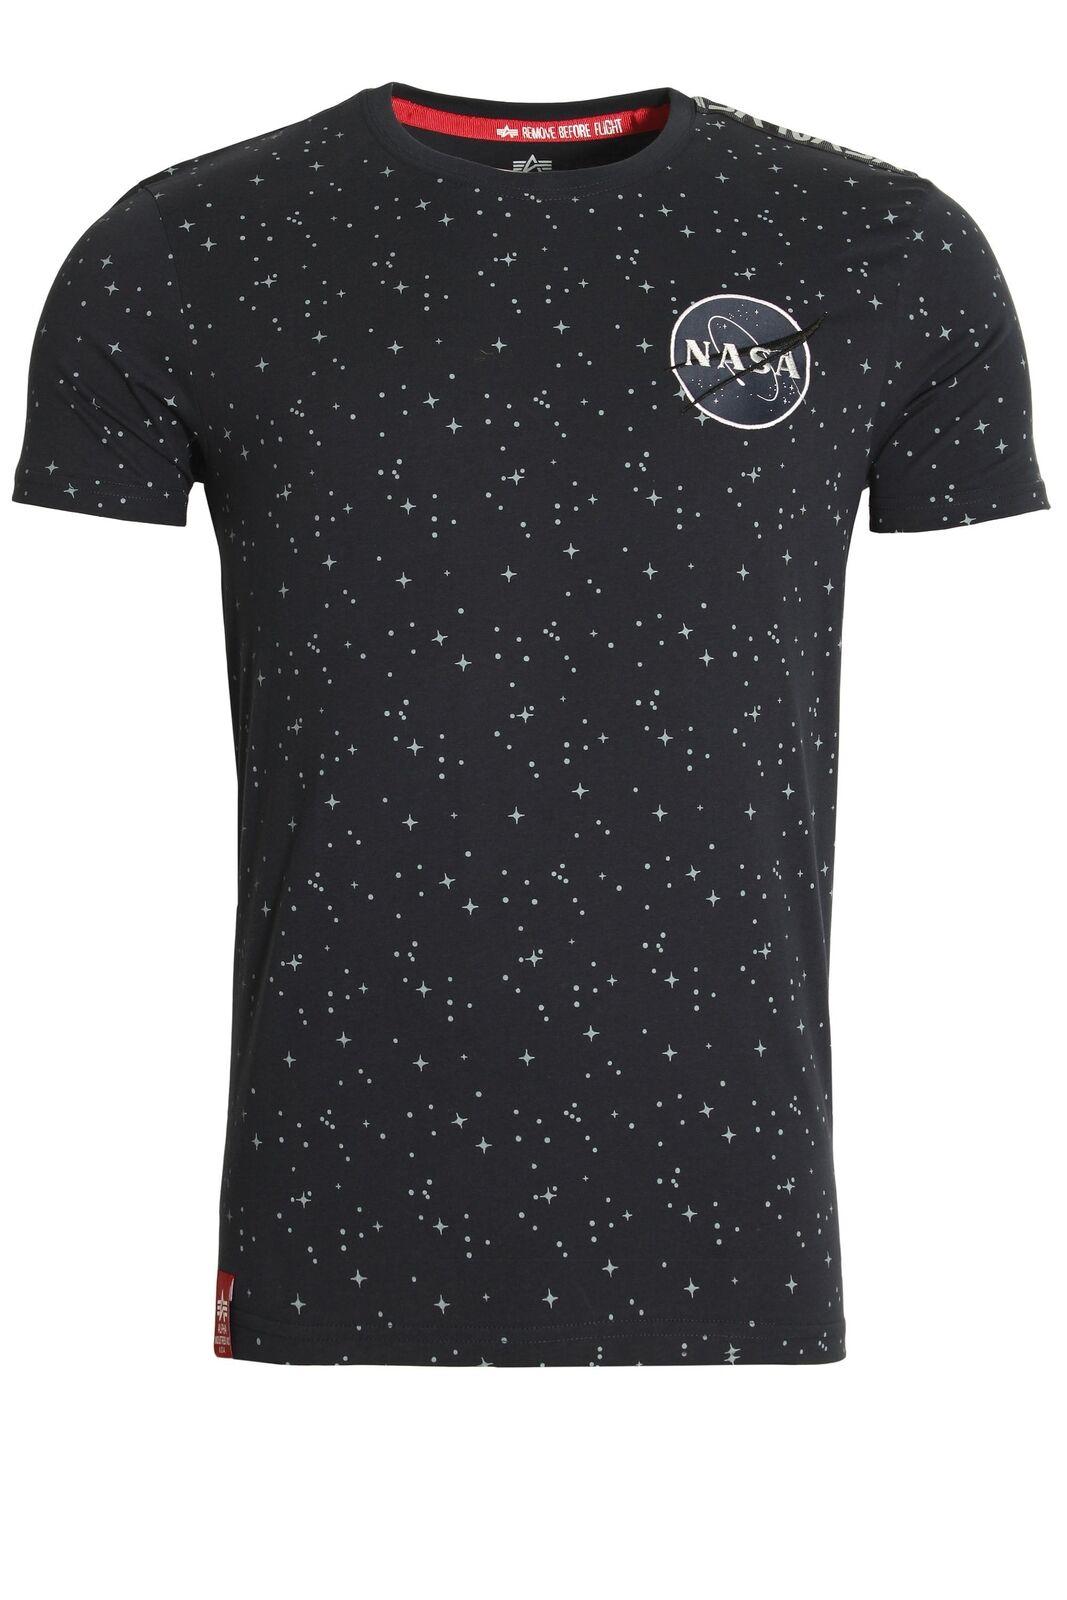 Mens T-Shirt ALPHA INDUSTRIES NASA Taped Star Print T-Shirt   Rep bluee